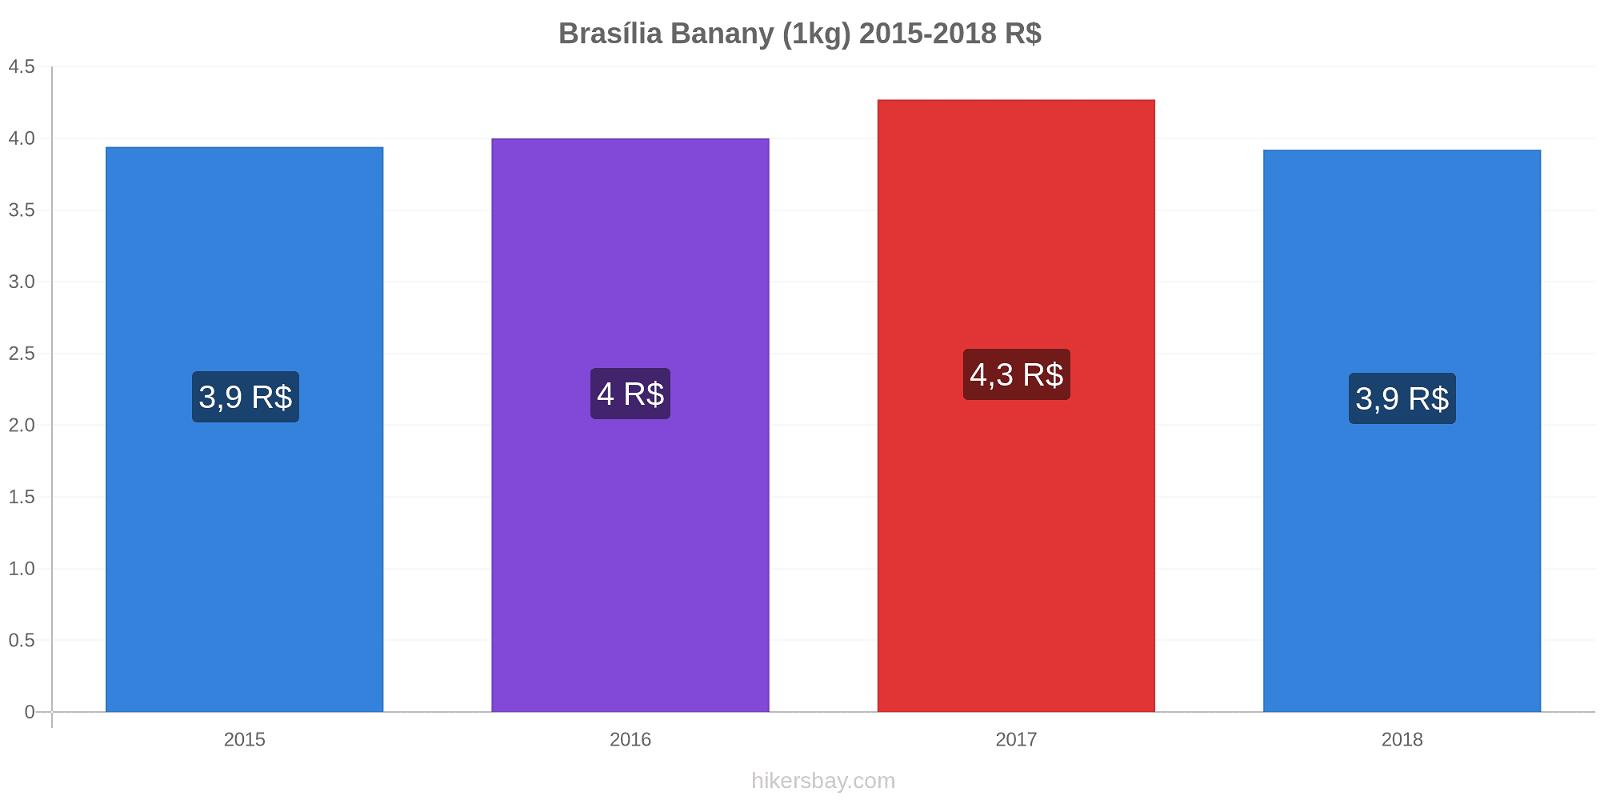 Brasília zmiany cen Banany (1kg) hikersbay.com